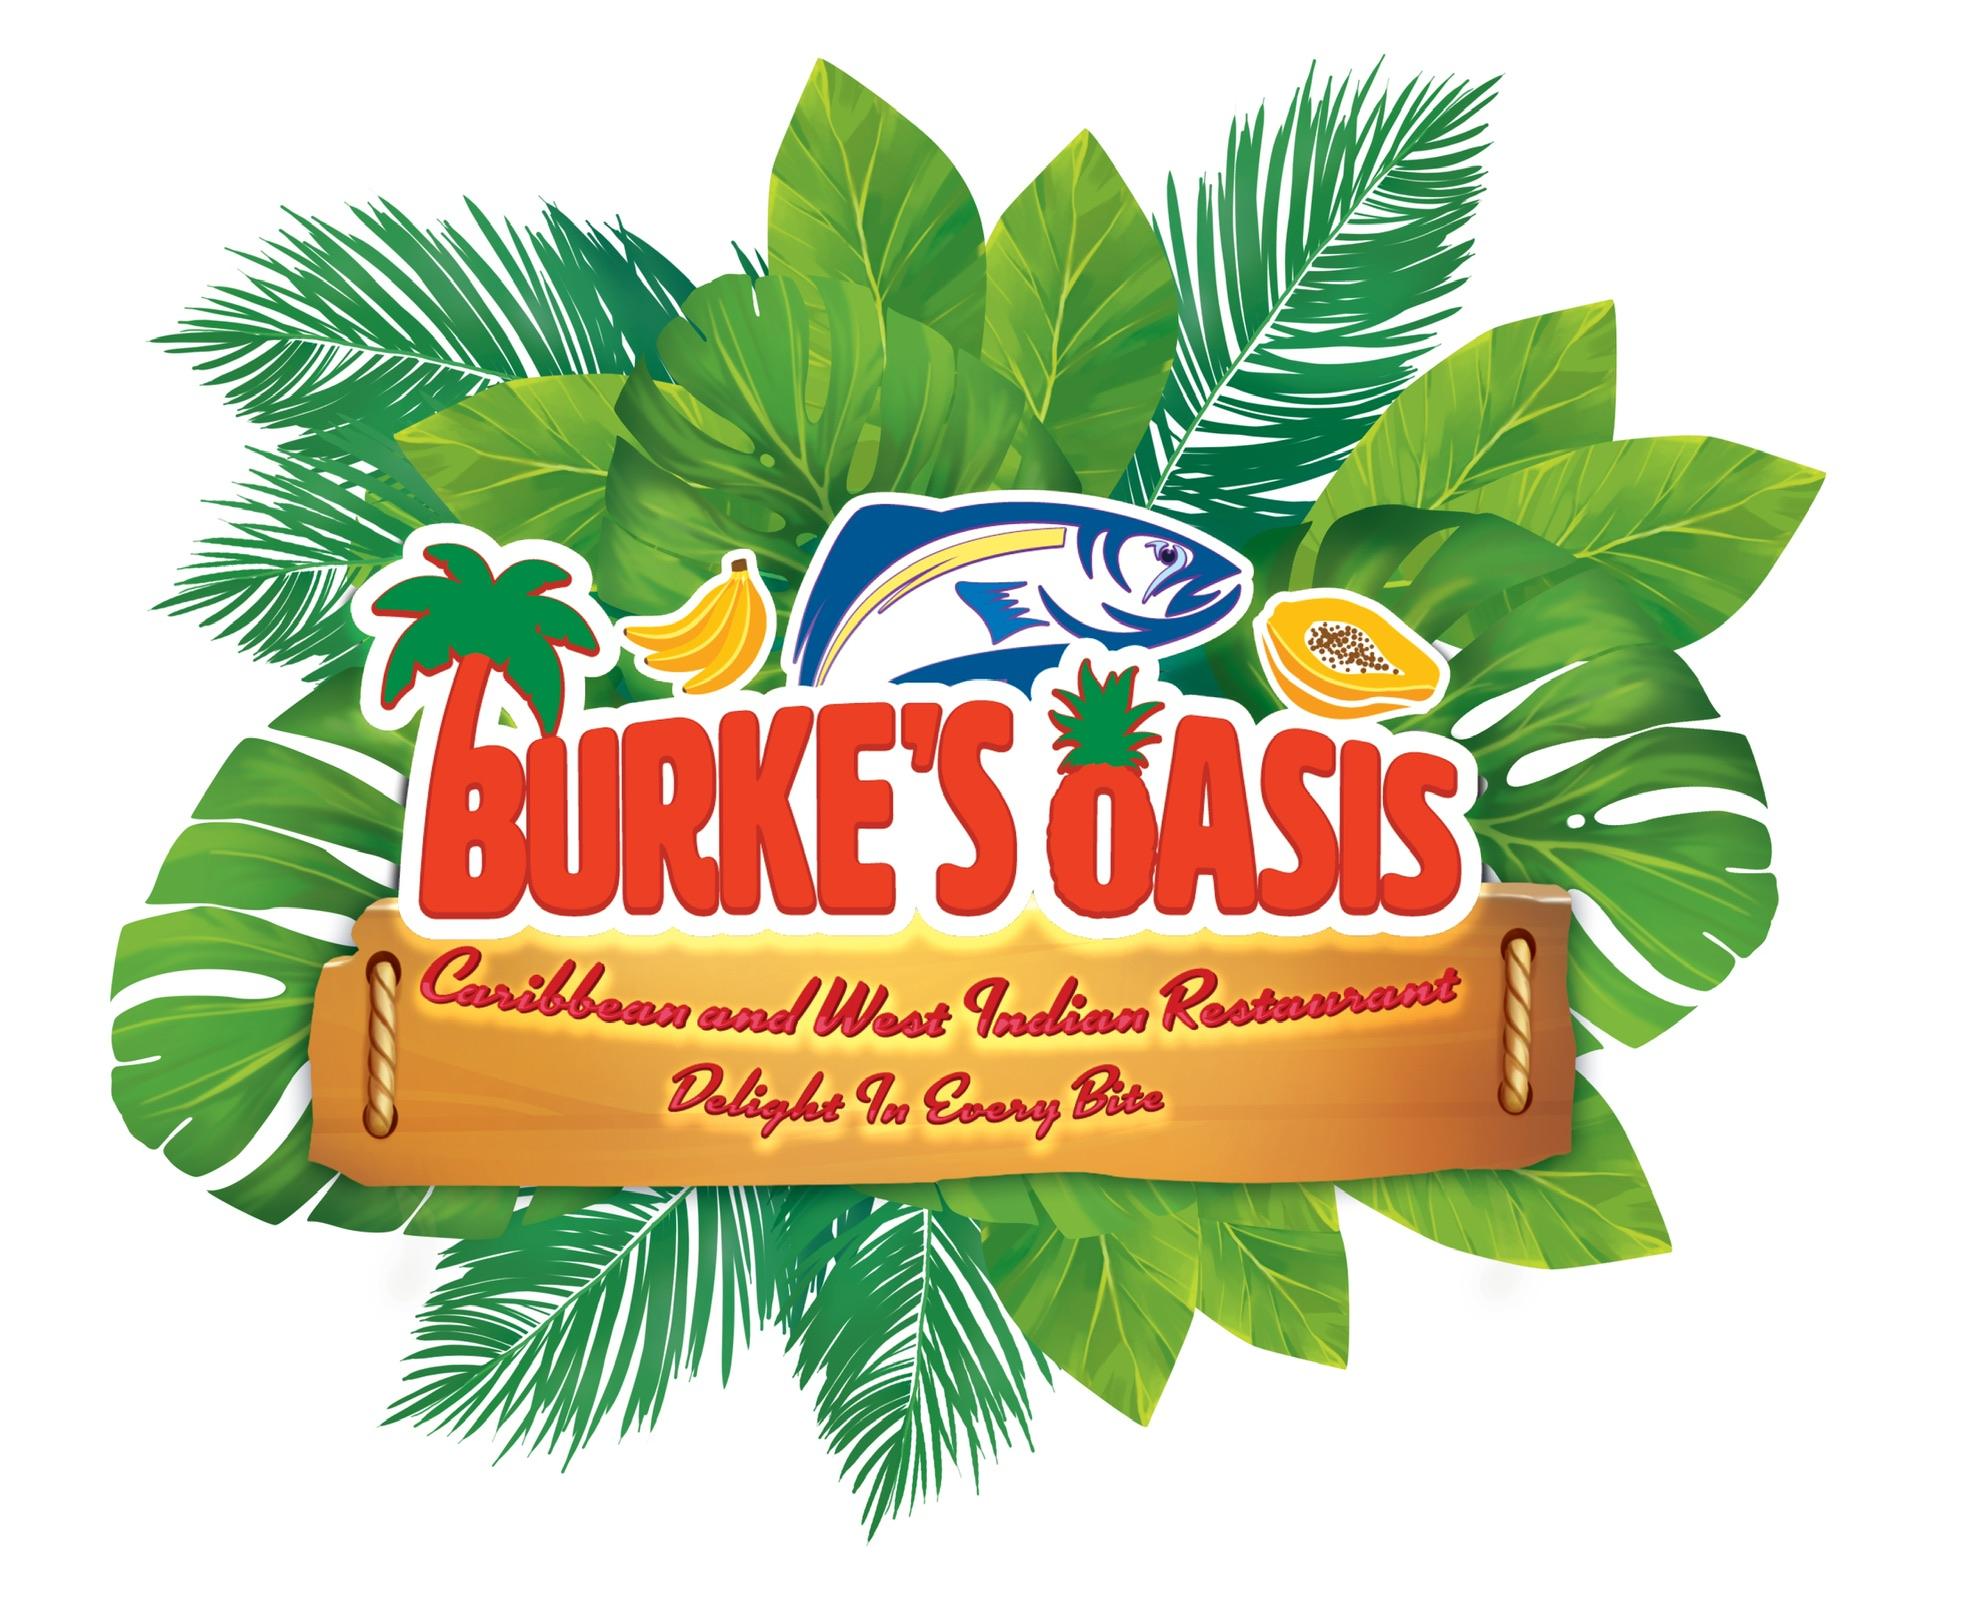 Burke's Oasis Caribbean & West Indian Restaurant LLC.